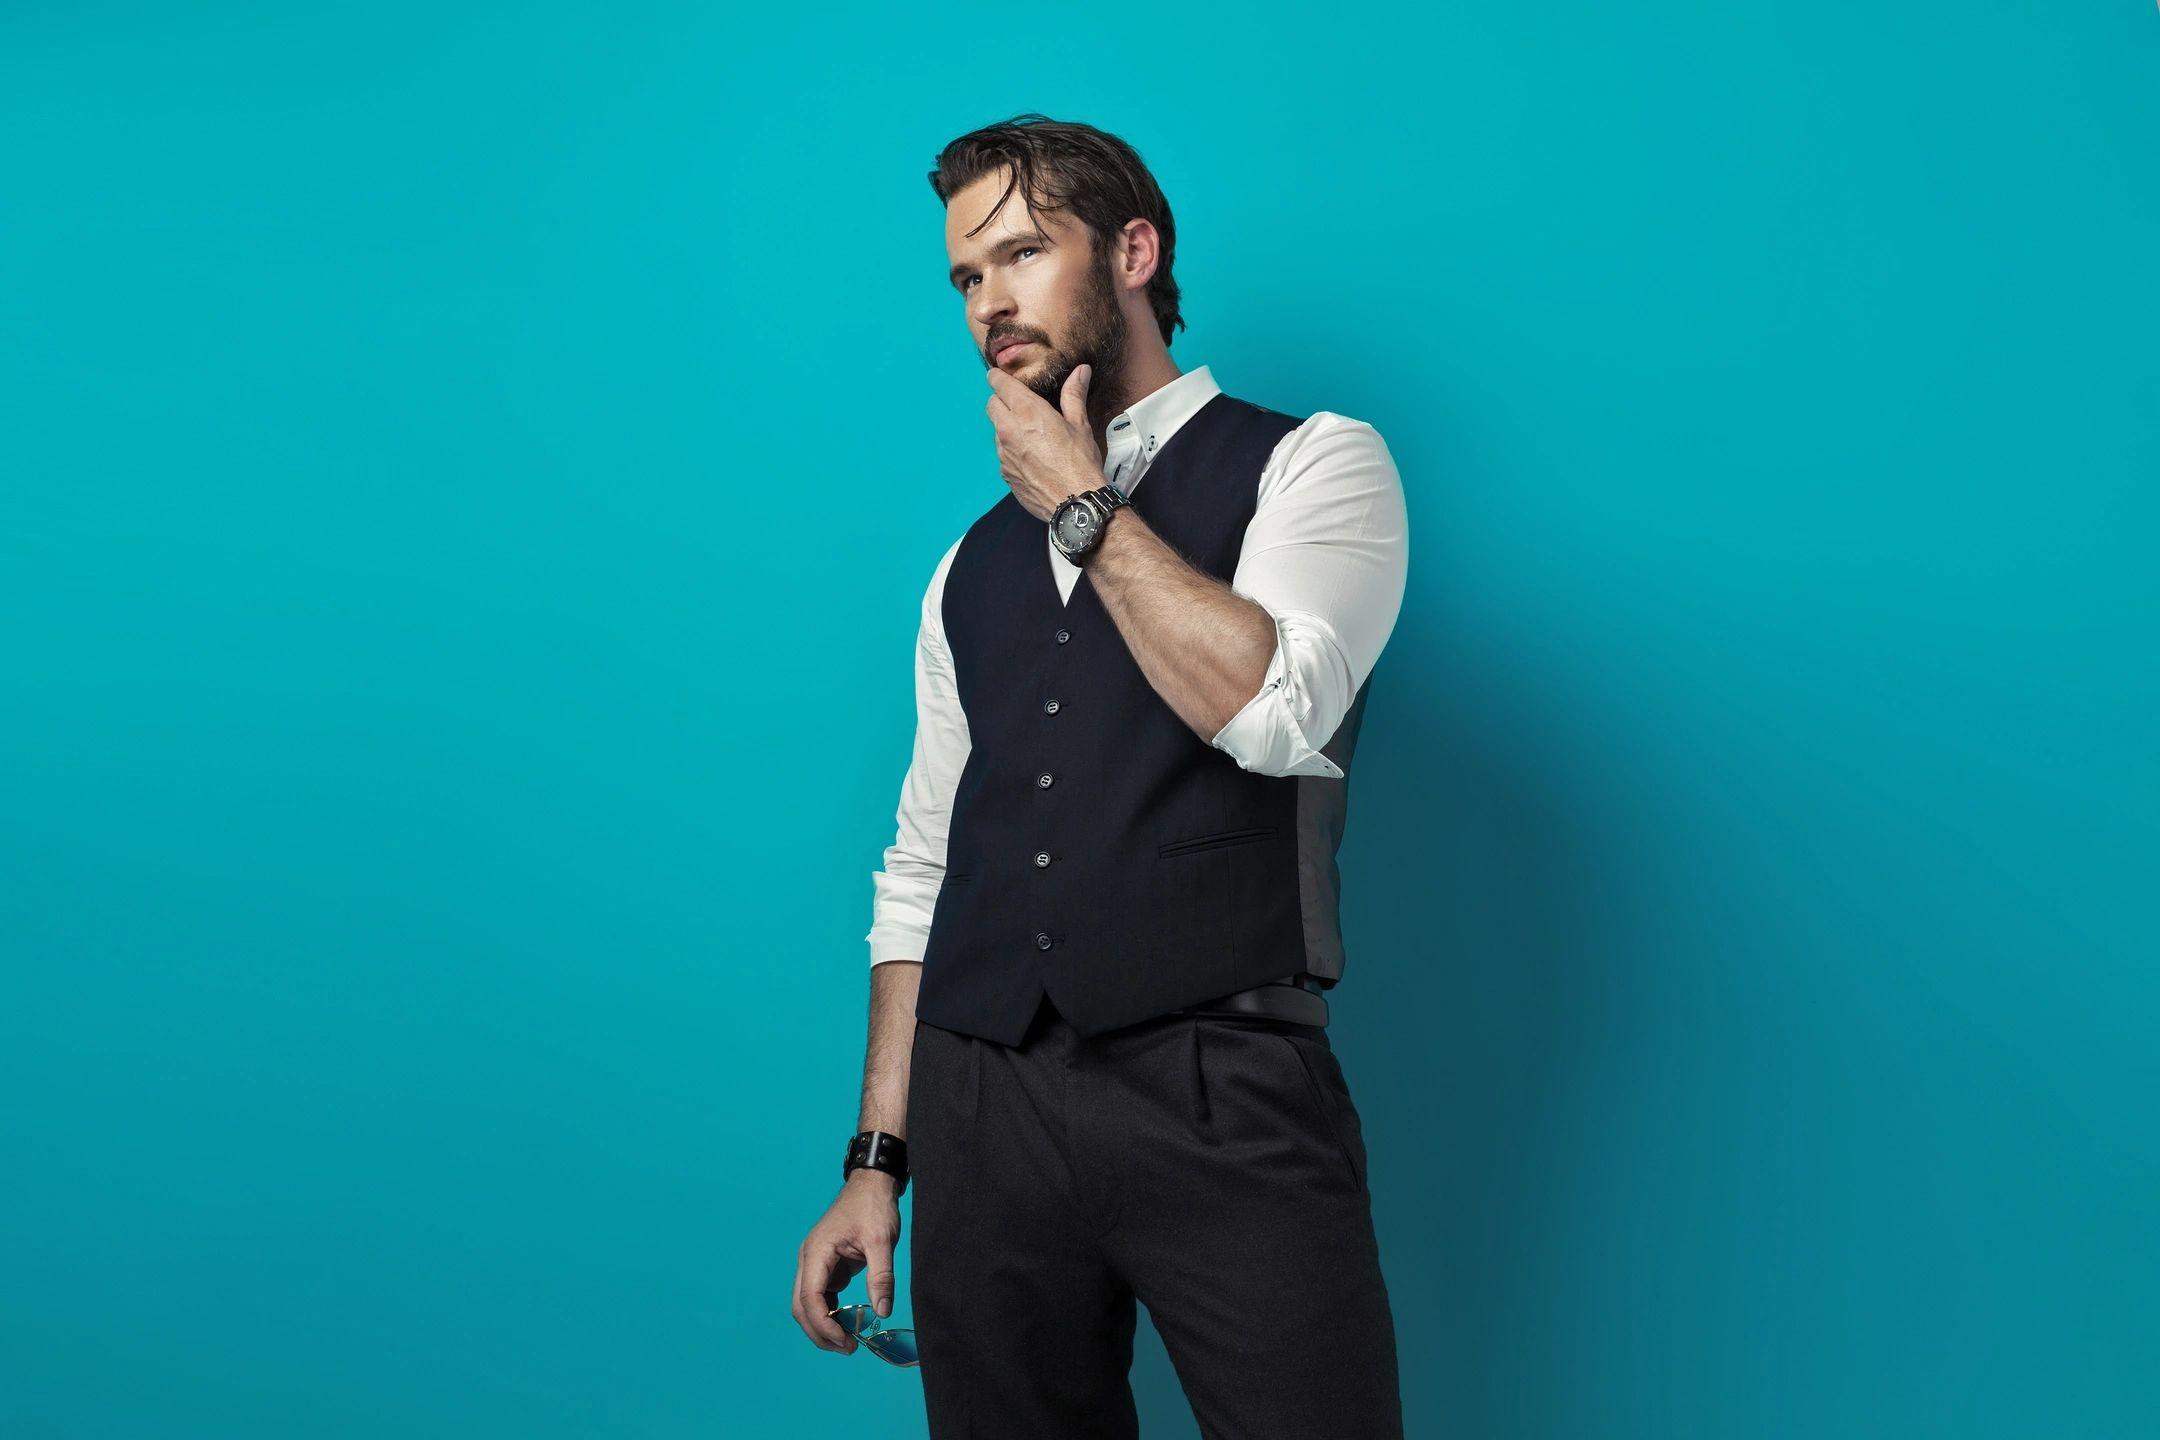 Sterling Images Model and Talent - Modeling Agency, Modeling